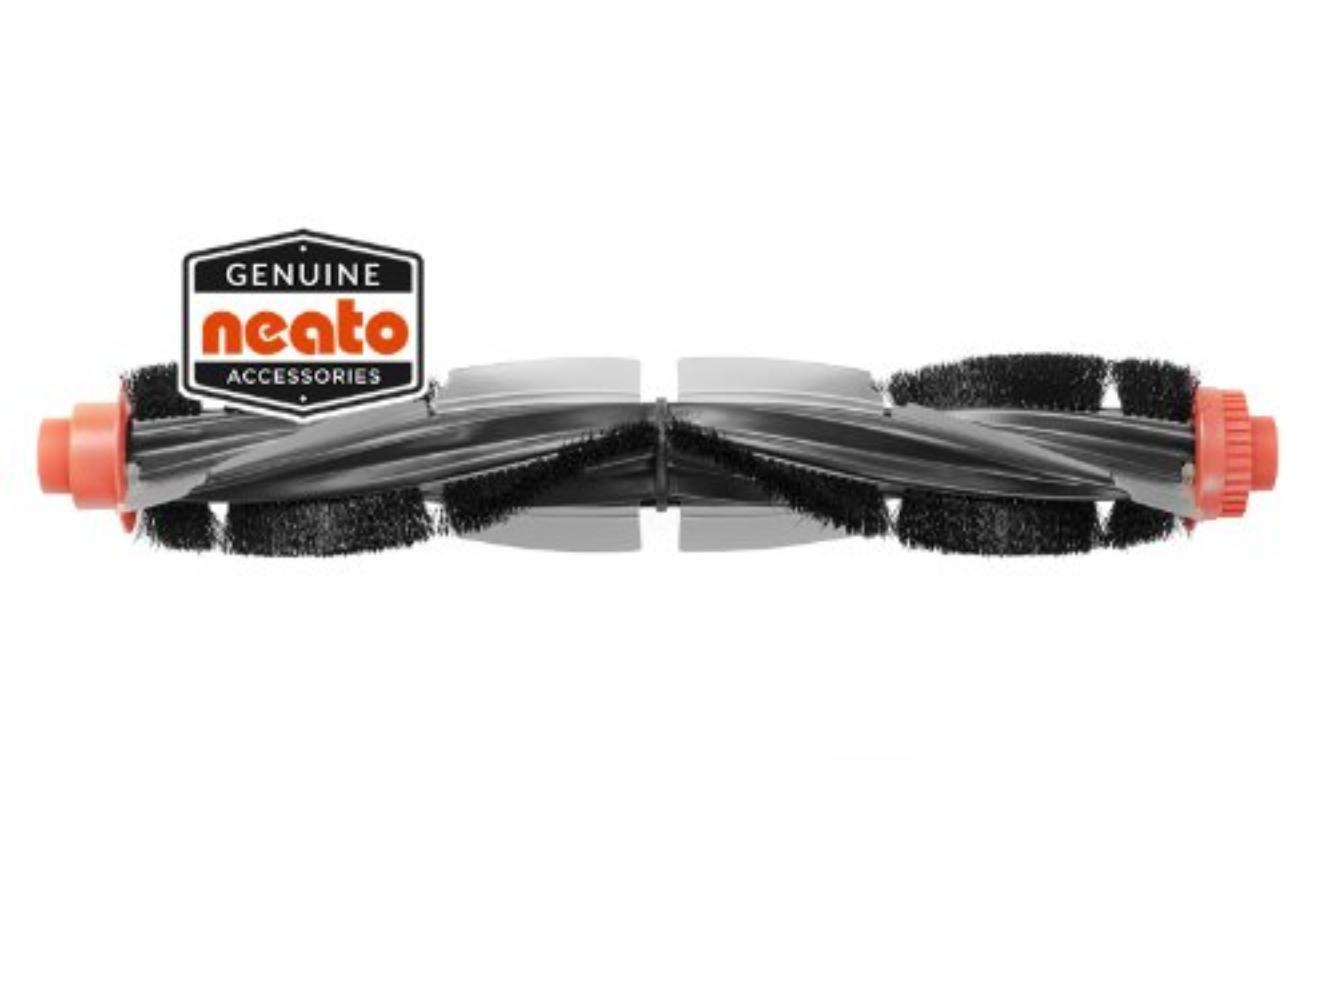 Neato Combo Brush for Neato XV Series Robot Vacuums